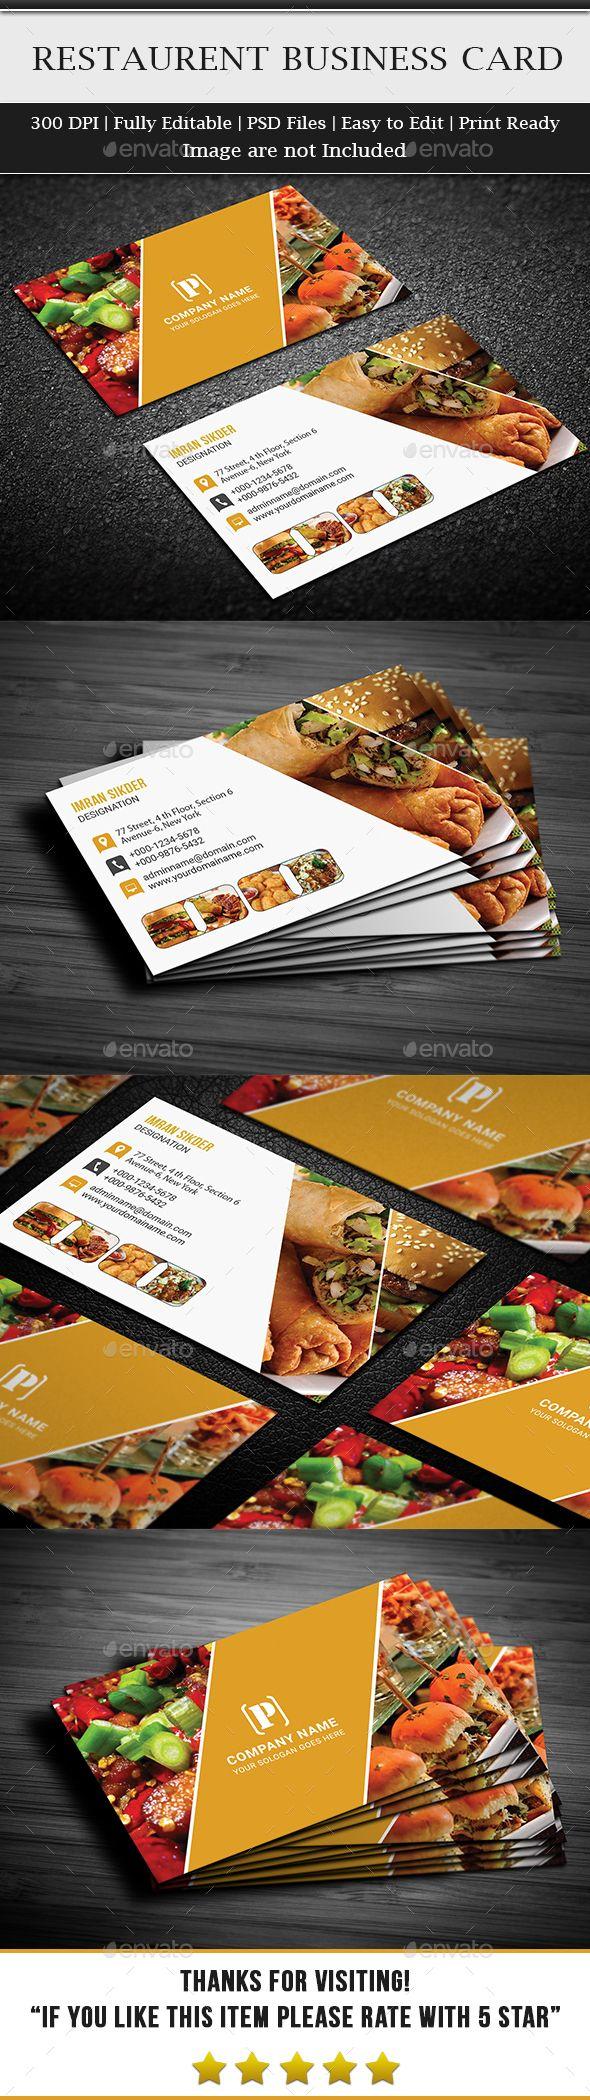 Restaurant Business Card | Pinterest | Tarjetas de presentación ...